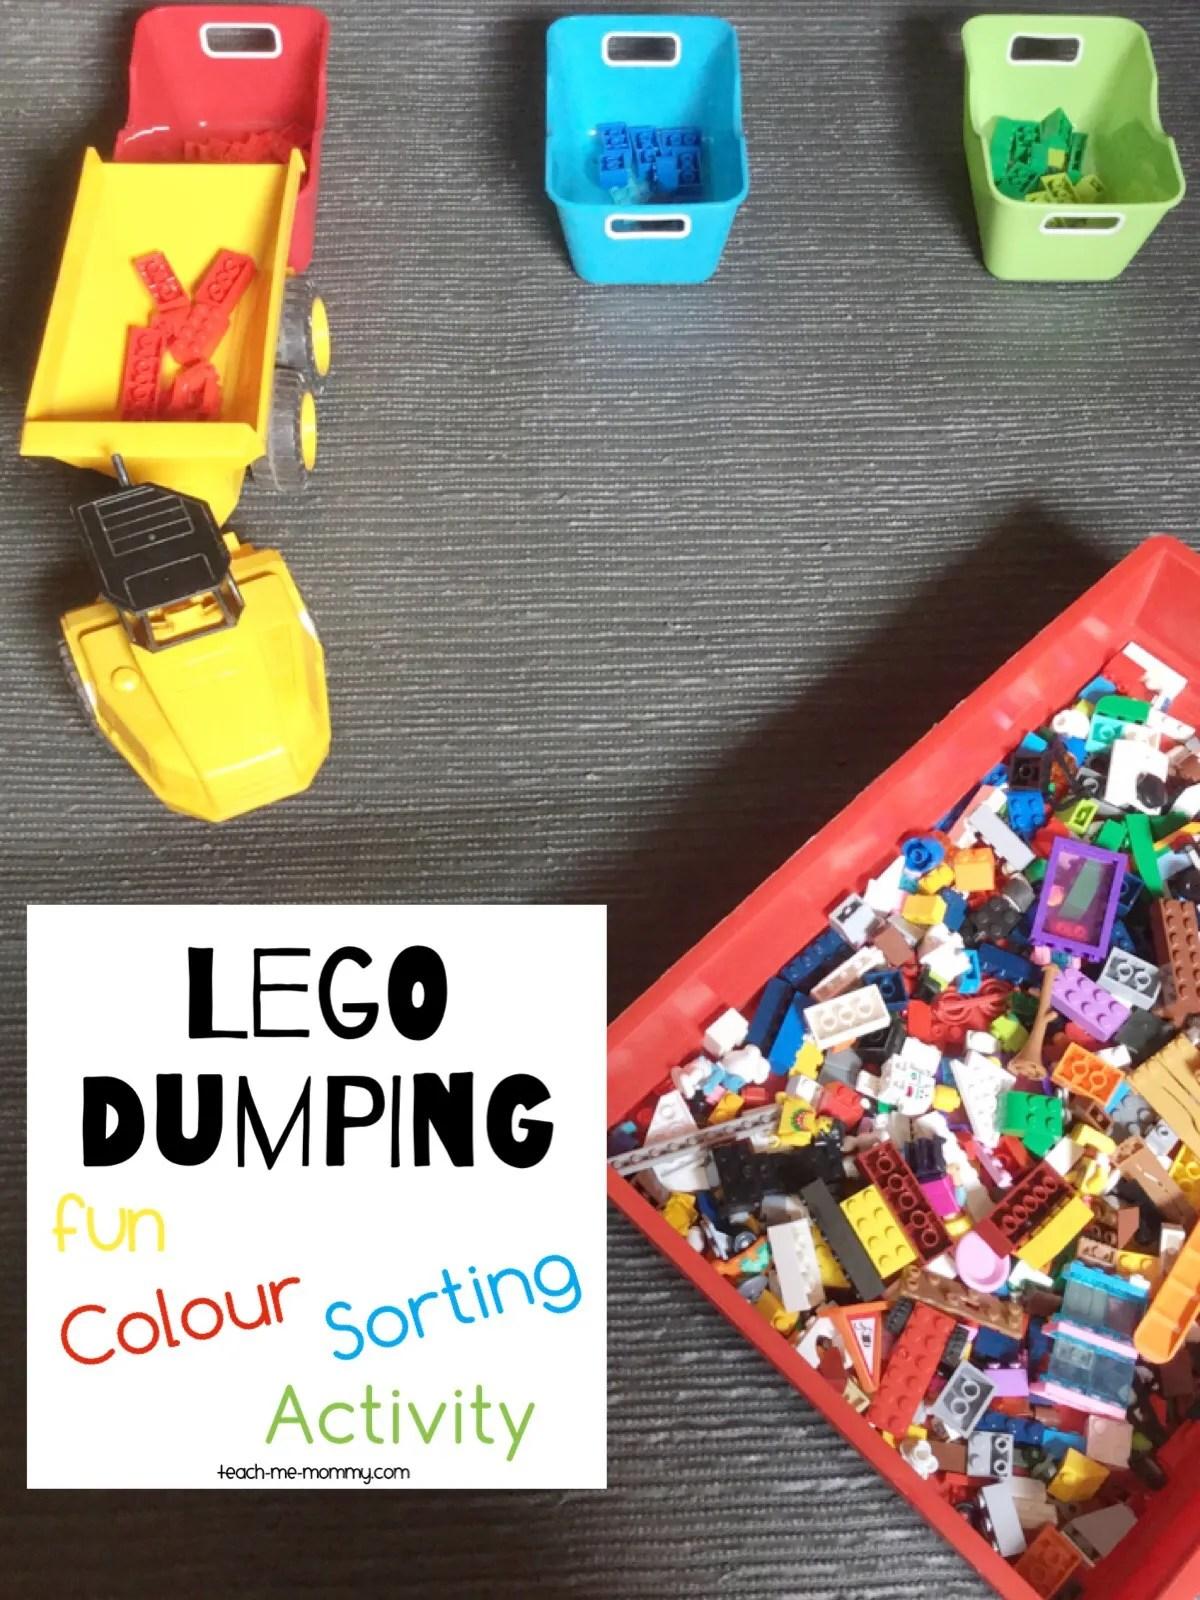 Lego Dumping Colour Sorting